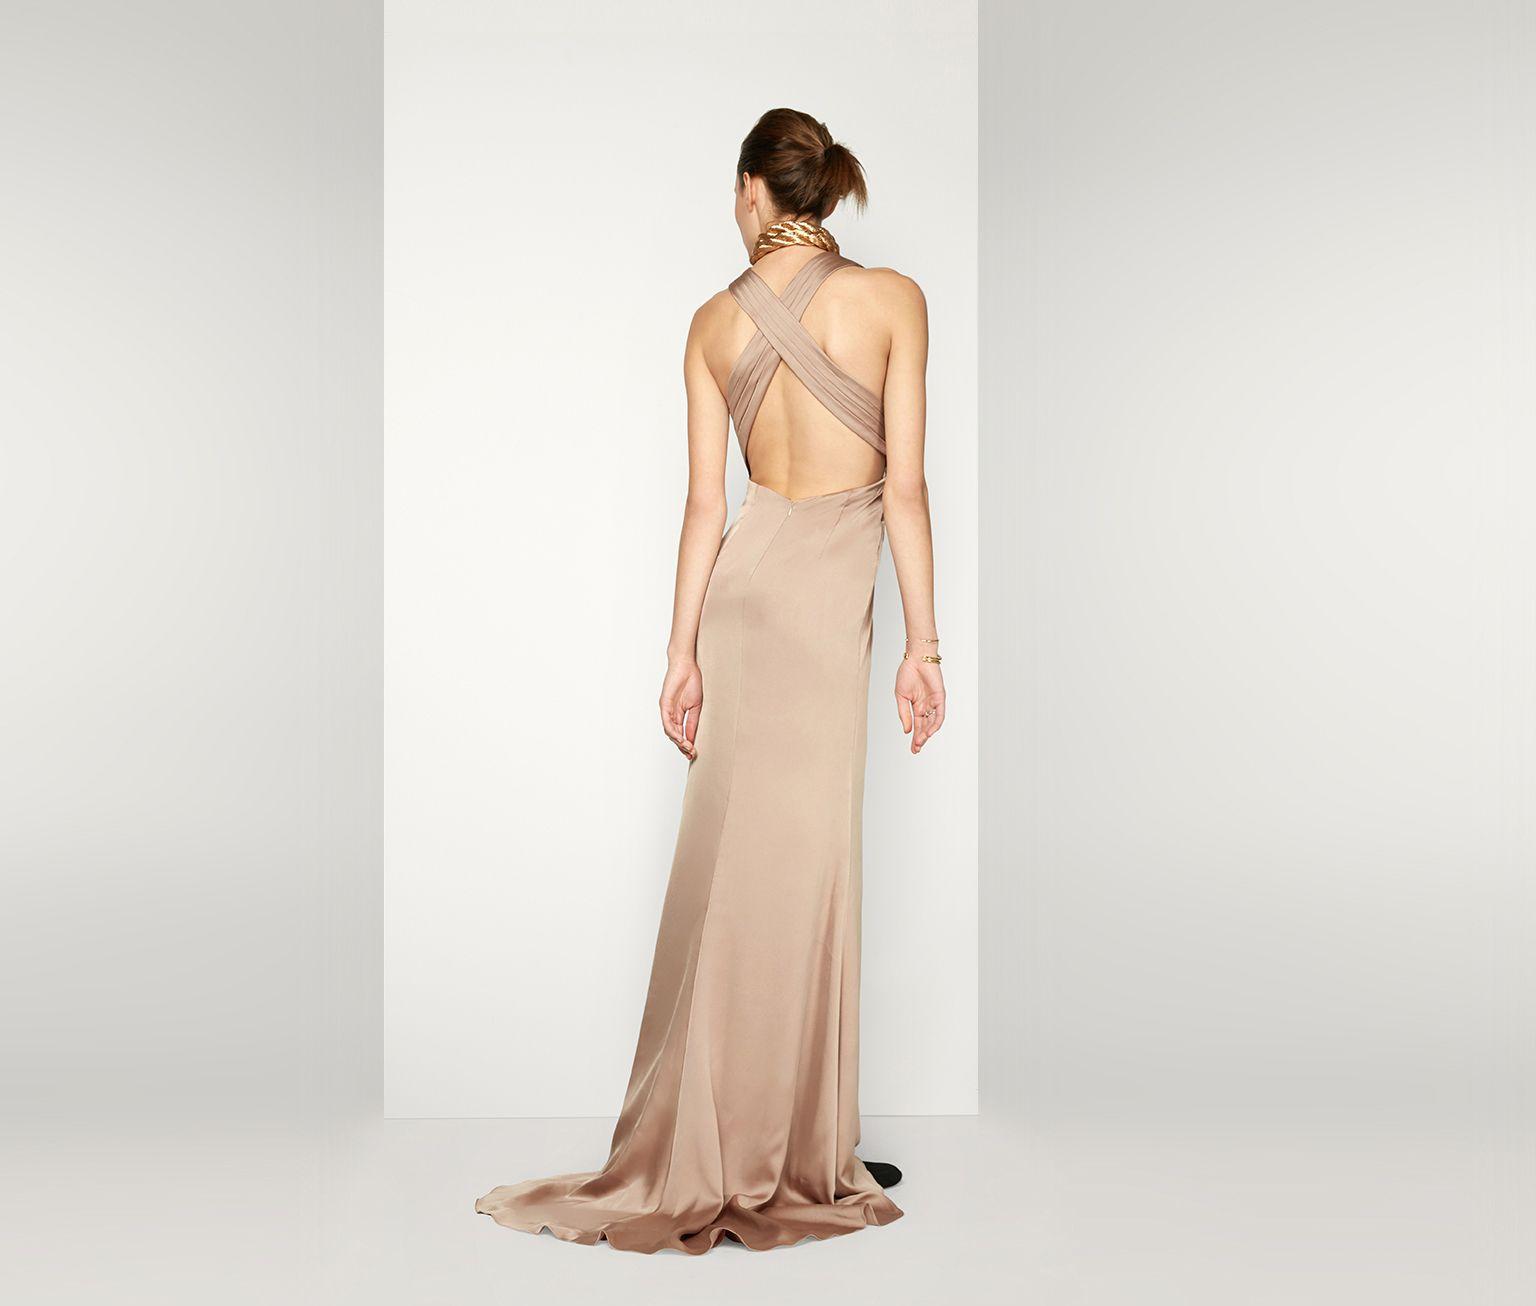 Dark Tan The Borealis Dress Fame Partners Usa Dresses Backless Dress Formal Evening Dresses [ 1306 x 1536 Pixel ]